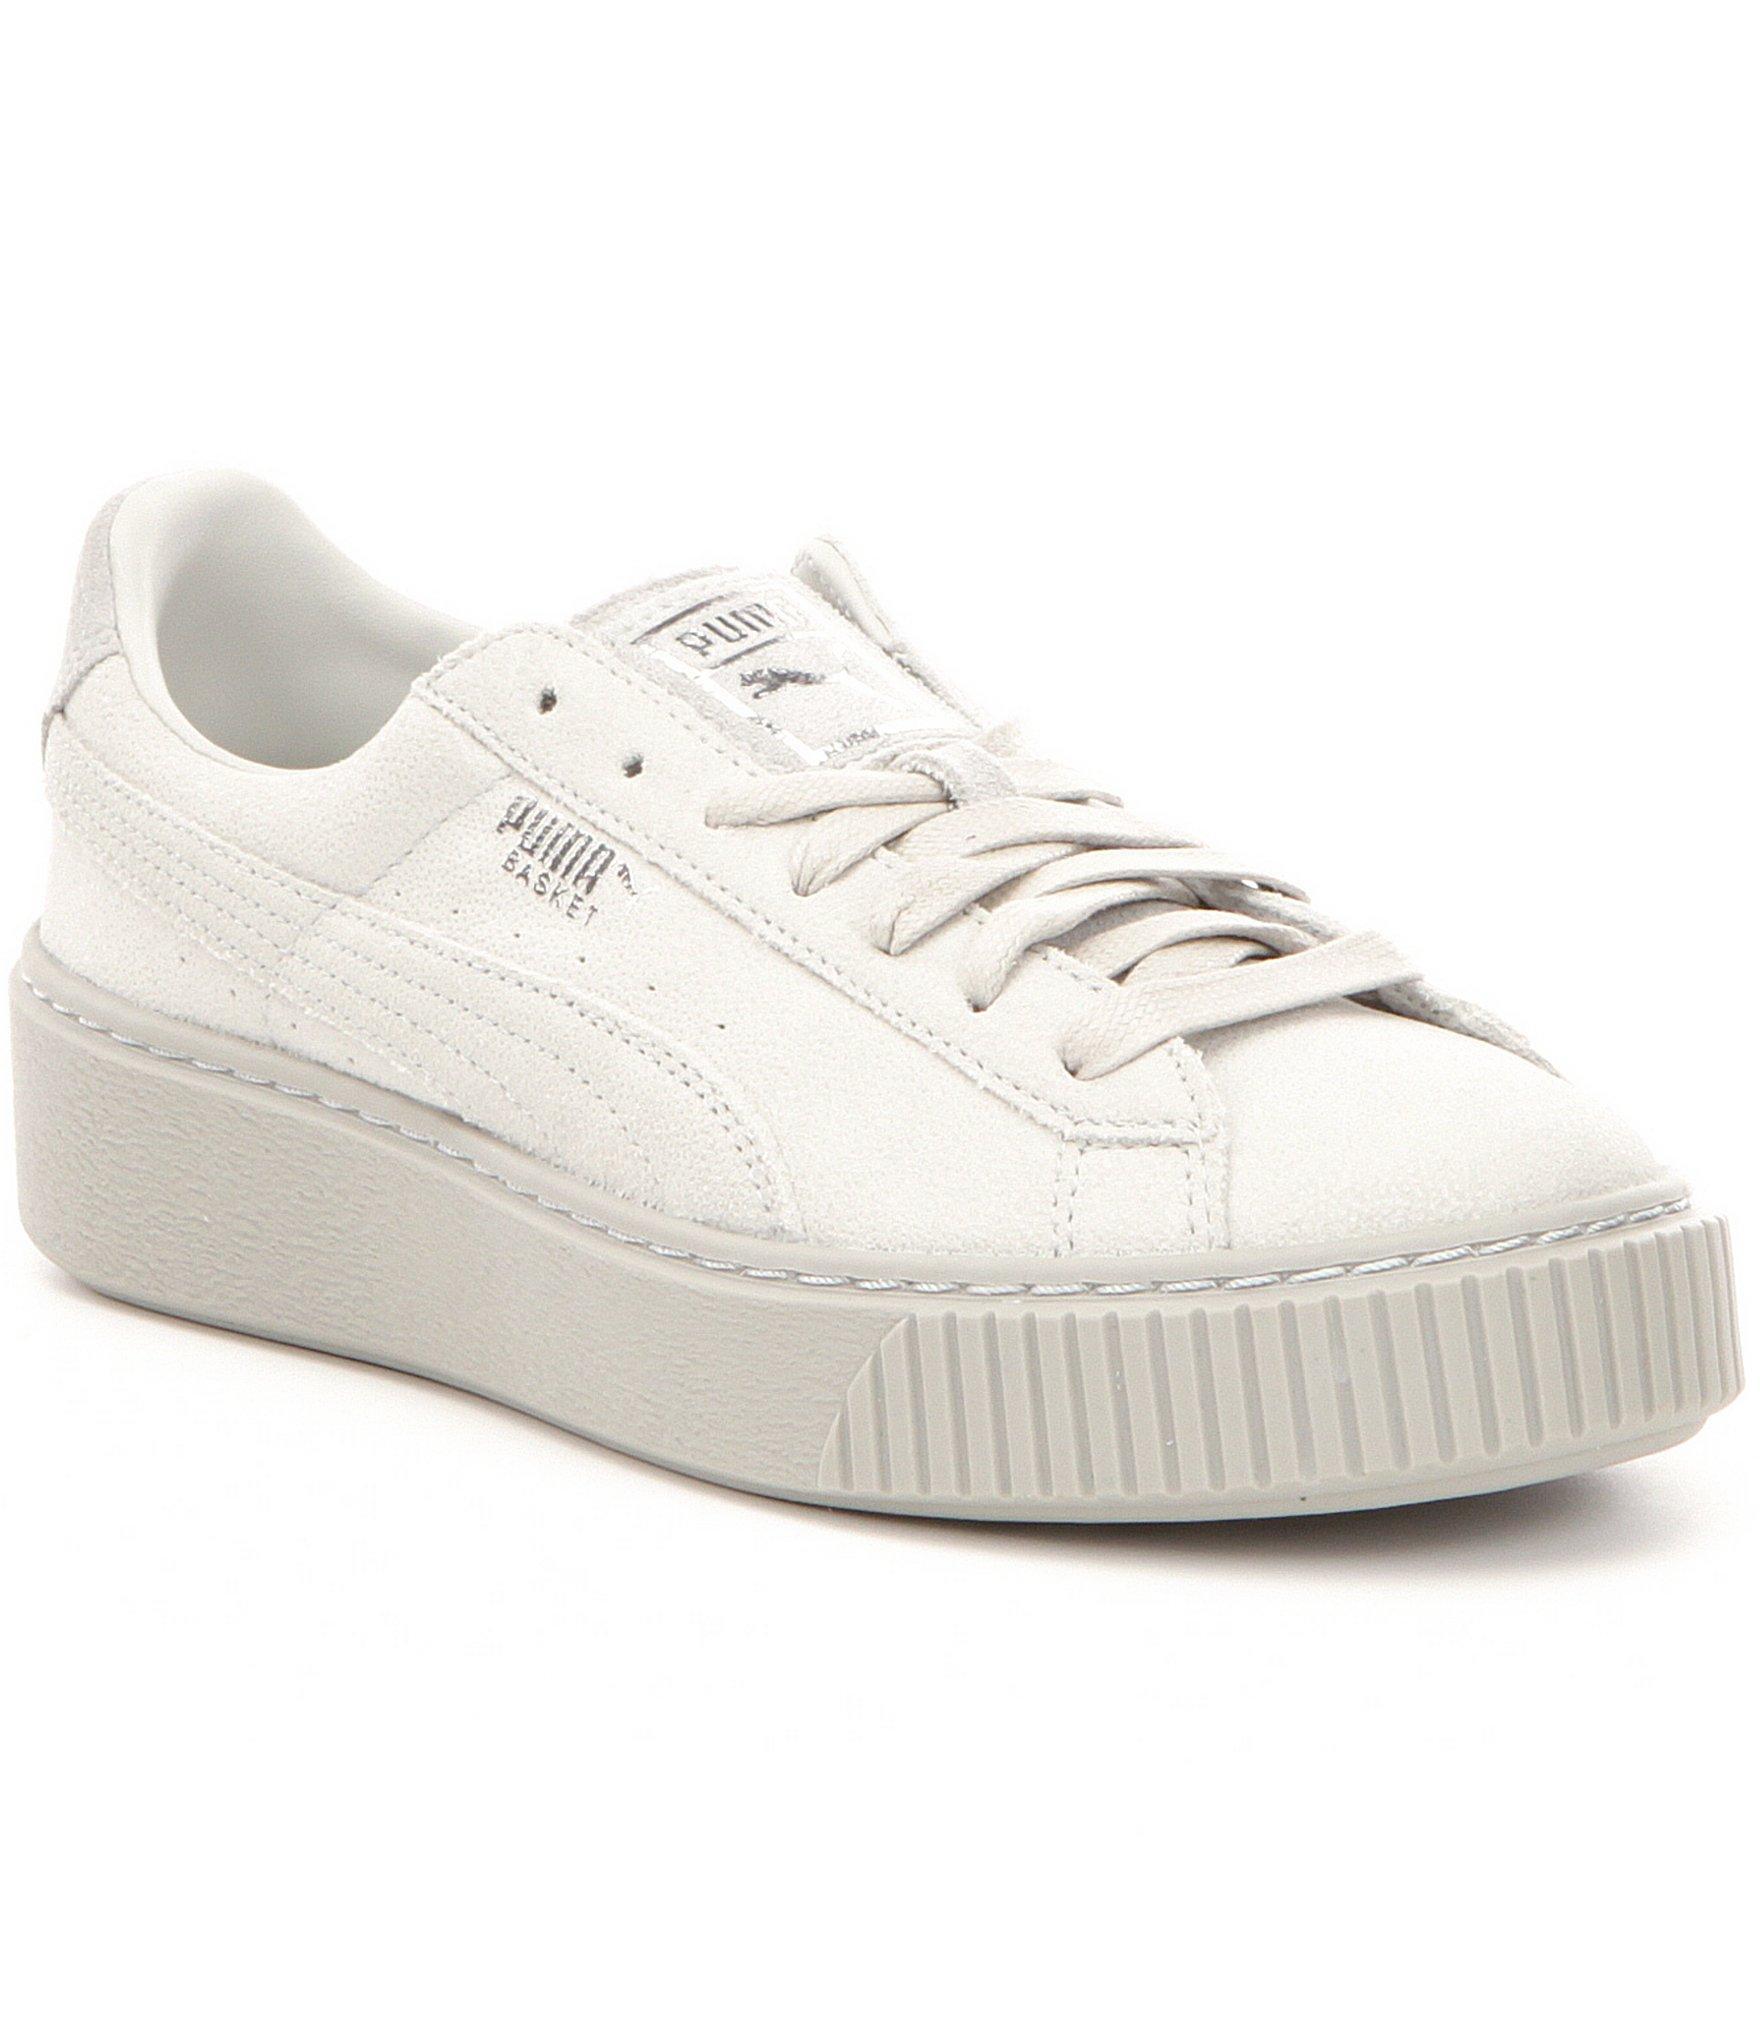 48347a98da4 Puma Basket Platform Patent - Women Shoes wearpointwindfarm.co.uk